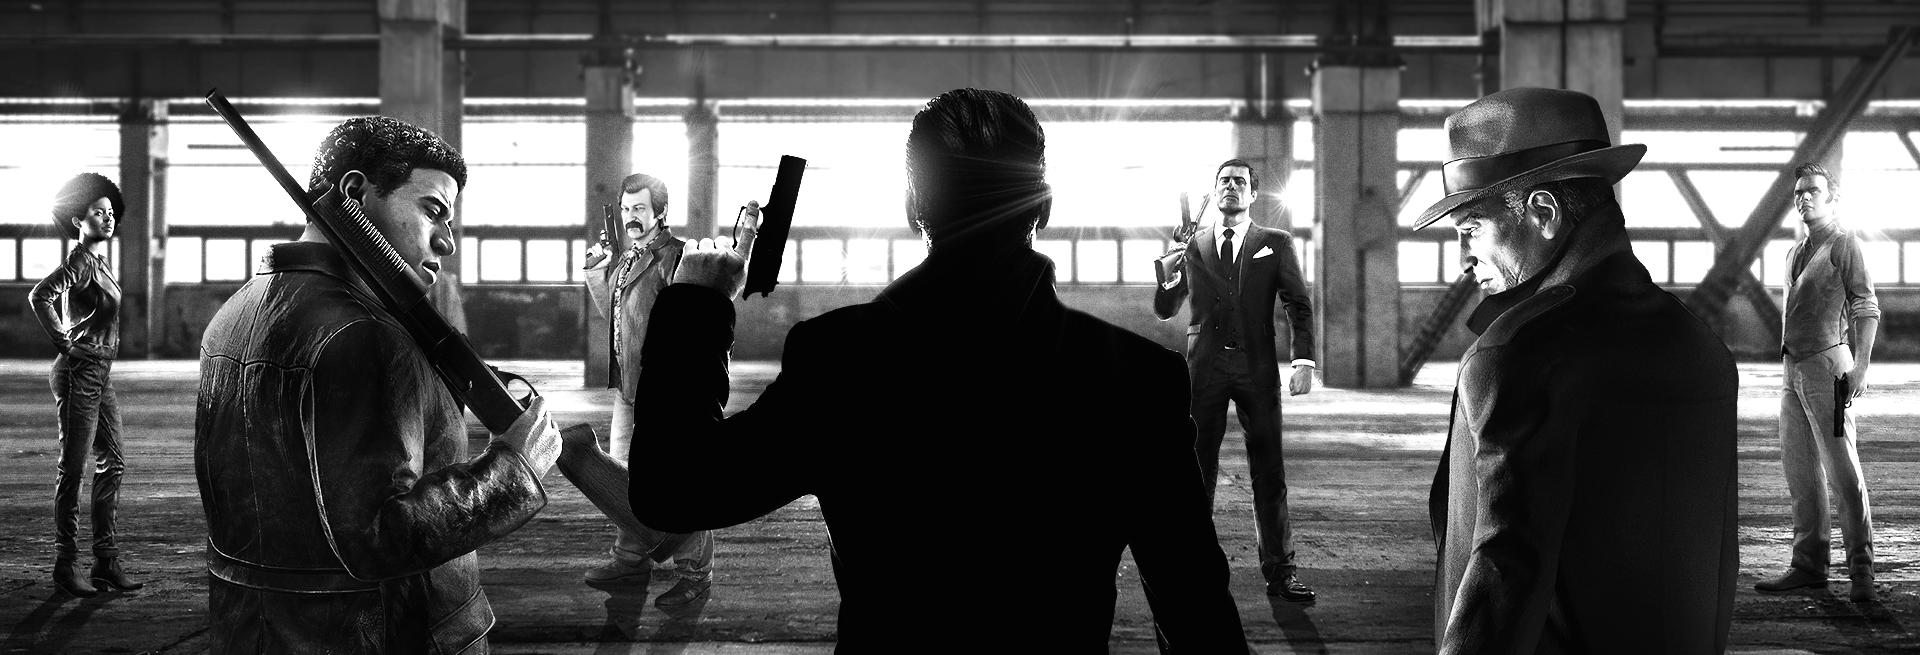 Review Mafia III